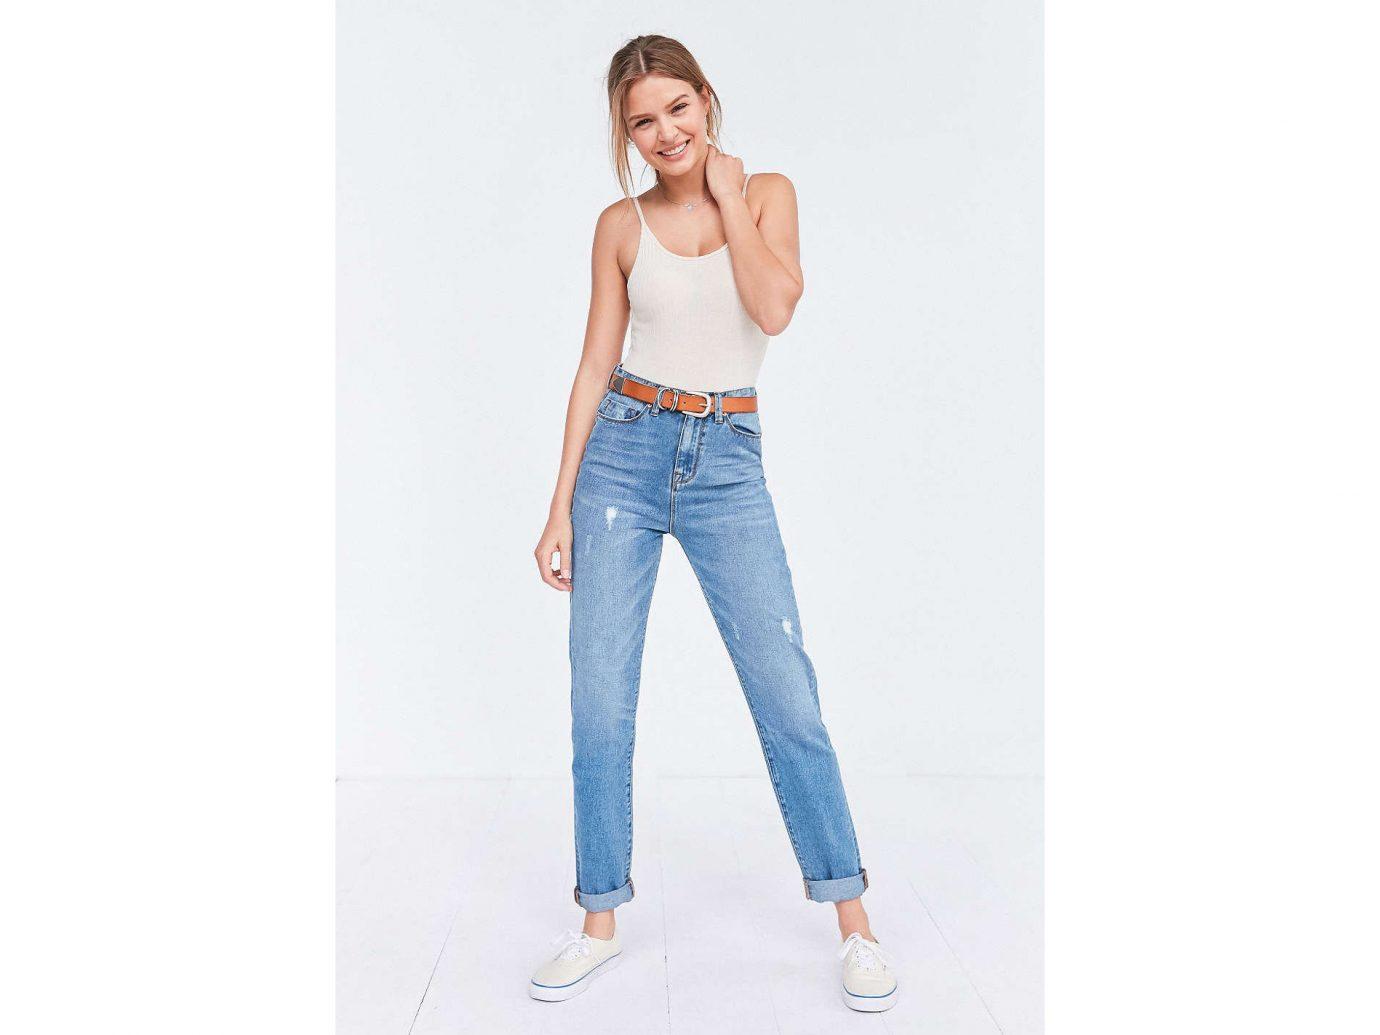 Style + Design clothing jeans denim person phone cellphone shoulder waist standing fashion model trousers joint abdomen one piece garment neck trunk trouser electric blue